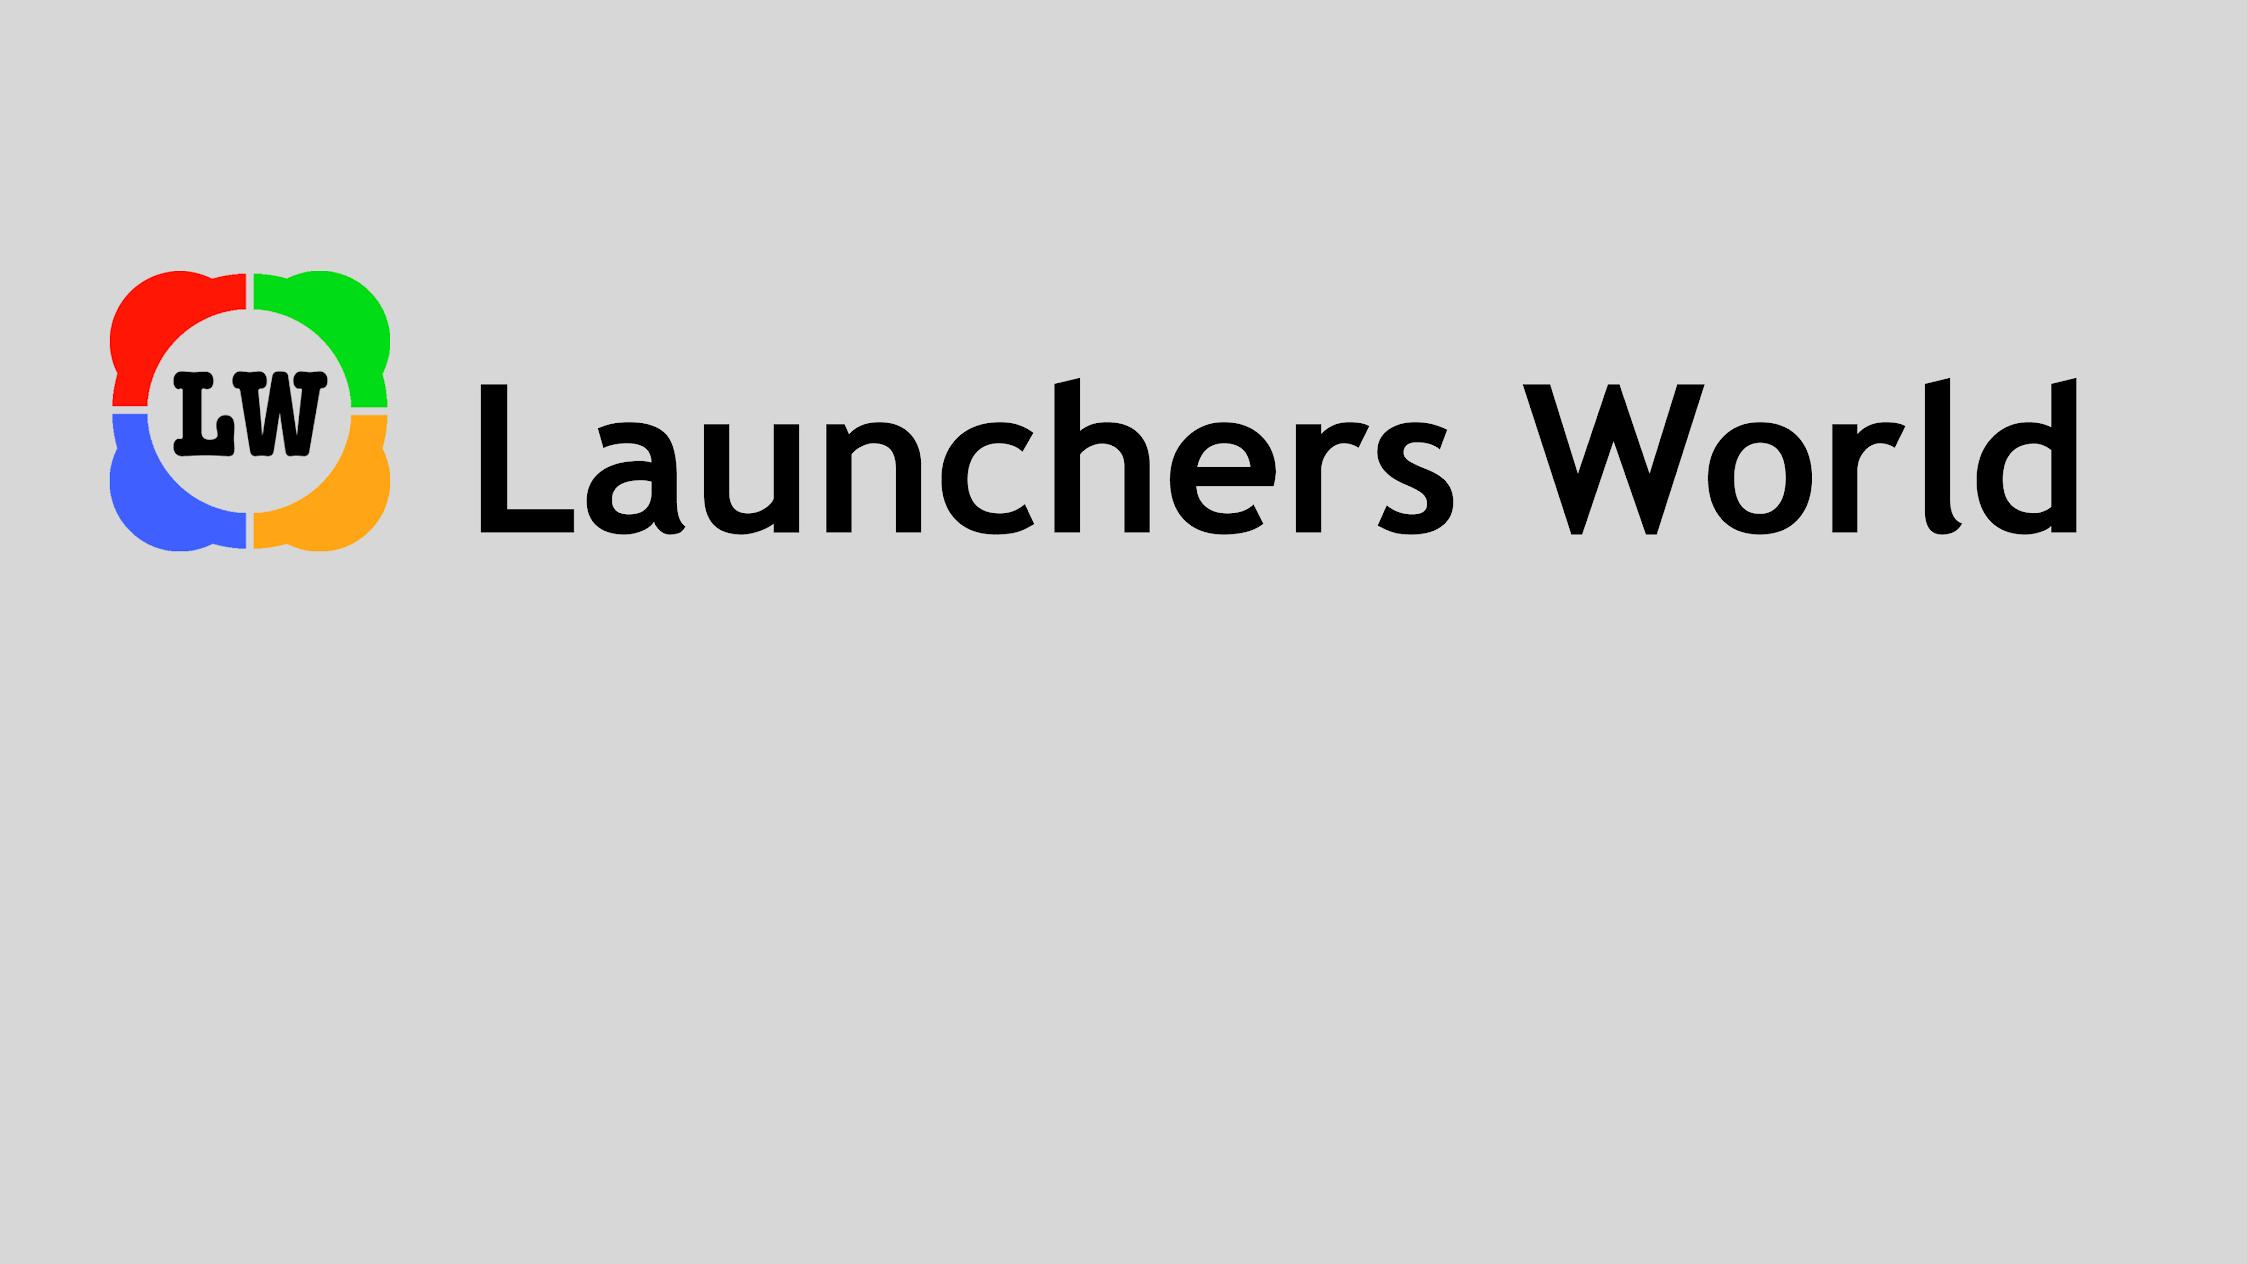 Launchers World